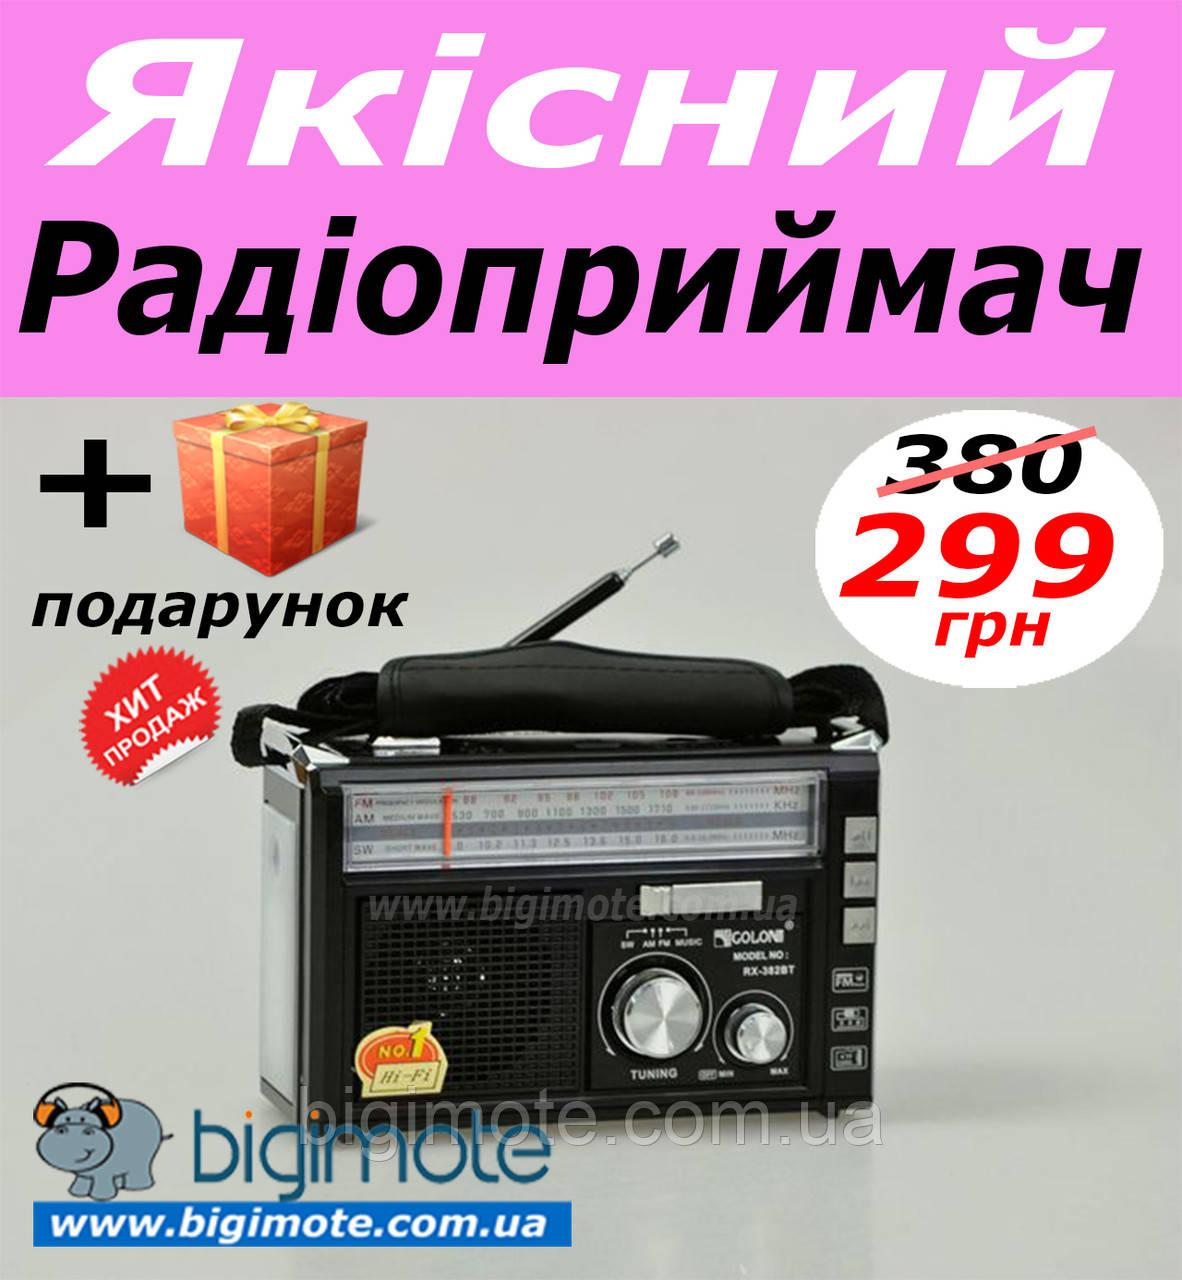 Радиприёмник, радіоприймач, приемник, приймач,радио,радіо, радіола, радиола, Качественный  RX-382 Golon